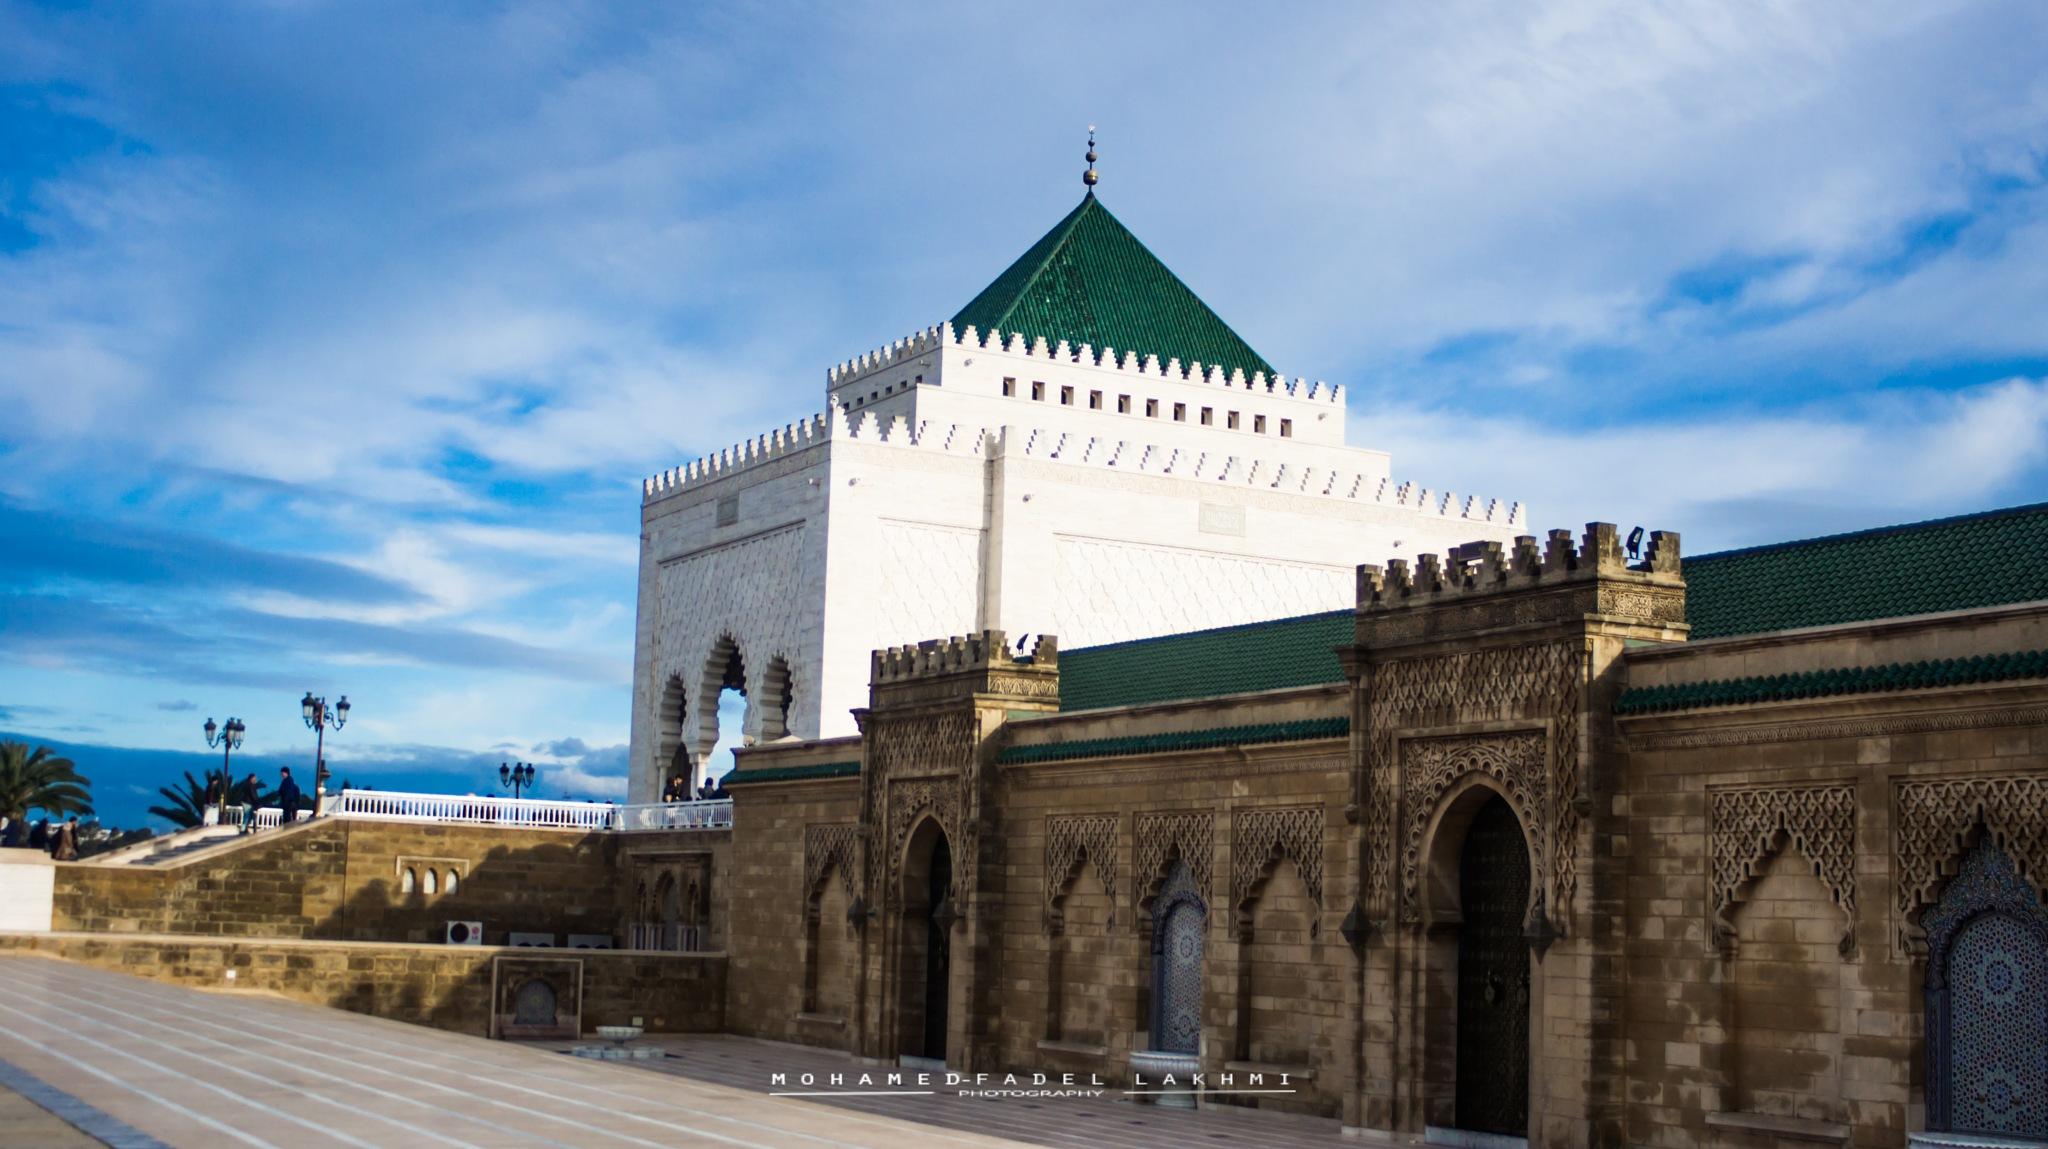 Hassan Rabat/Morocco by Mohamed-Fadel Lakhmi